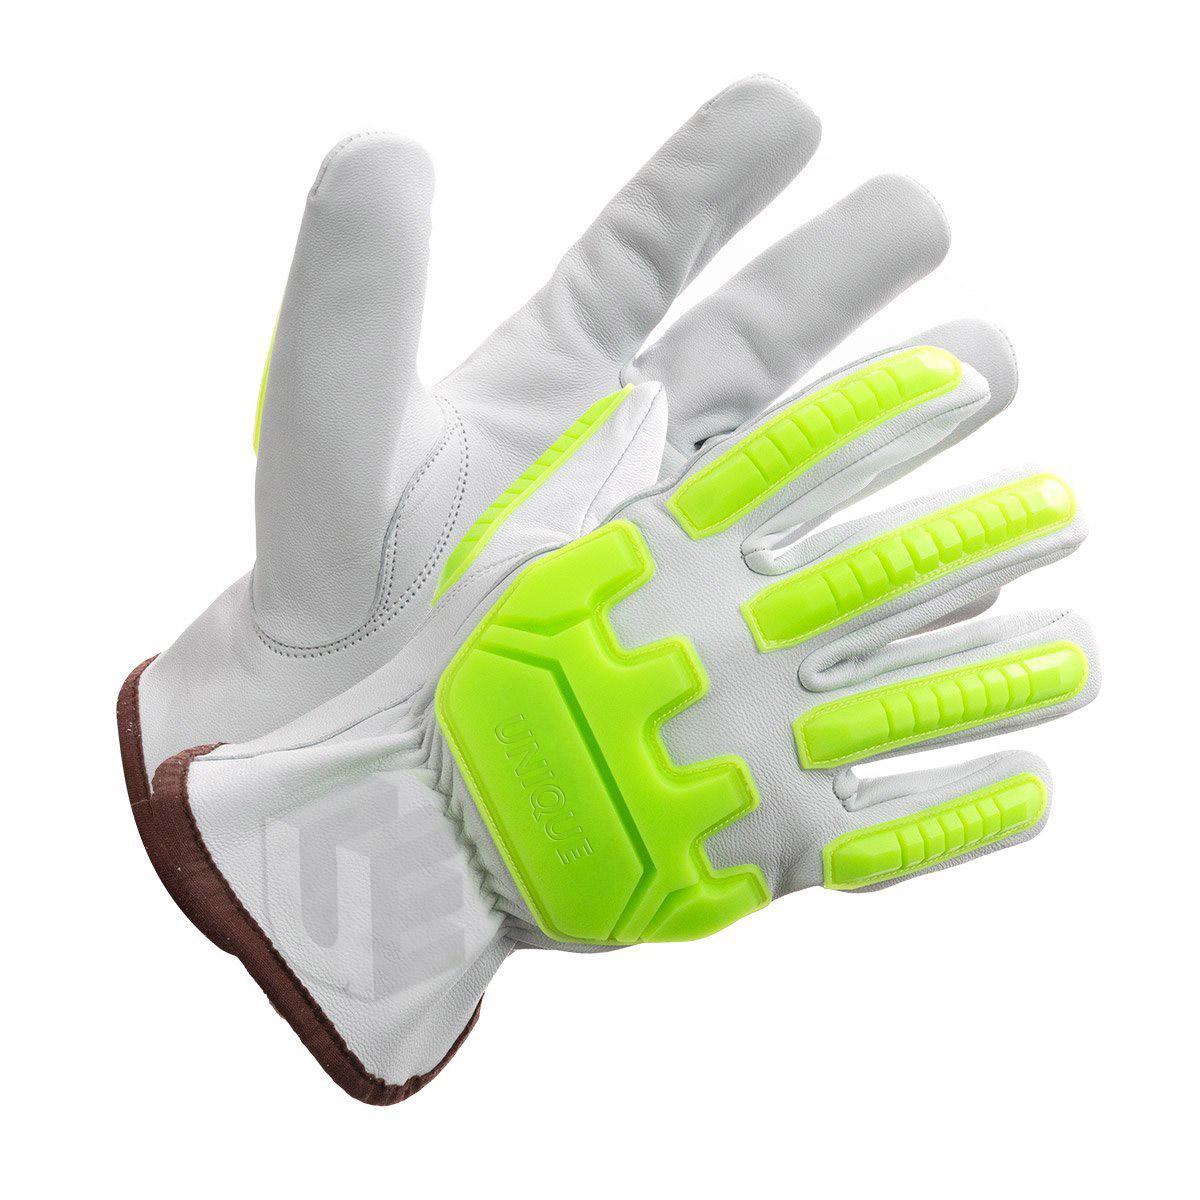 Natural Goat Skin Driver Glove